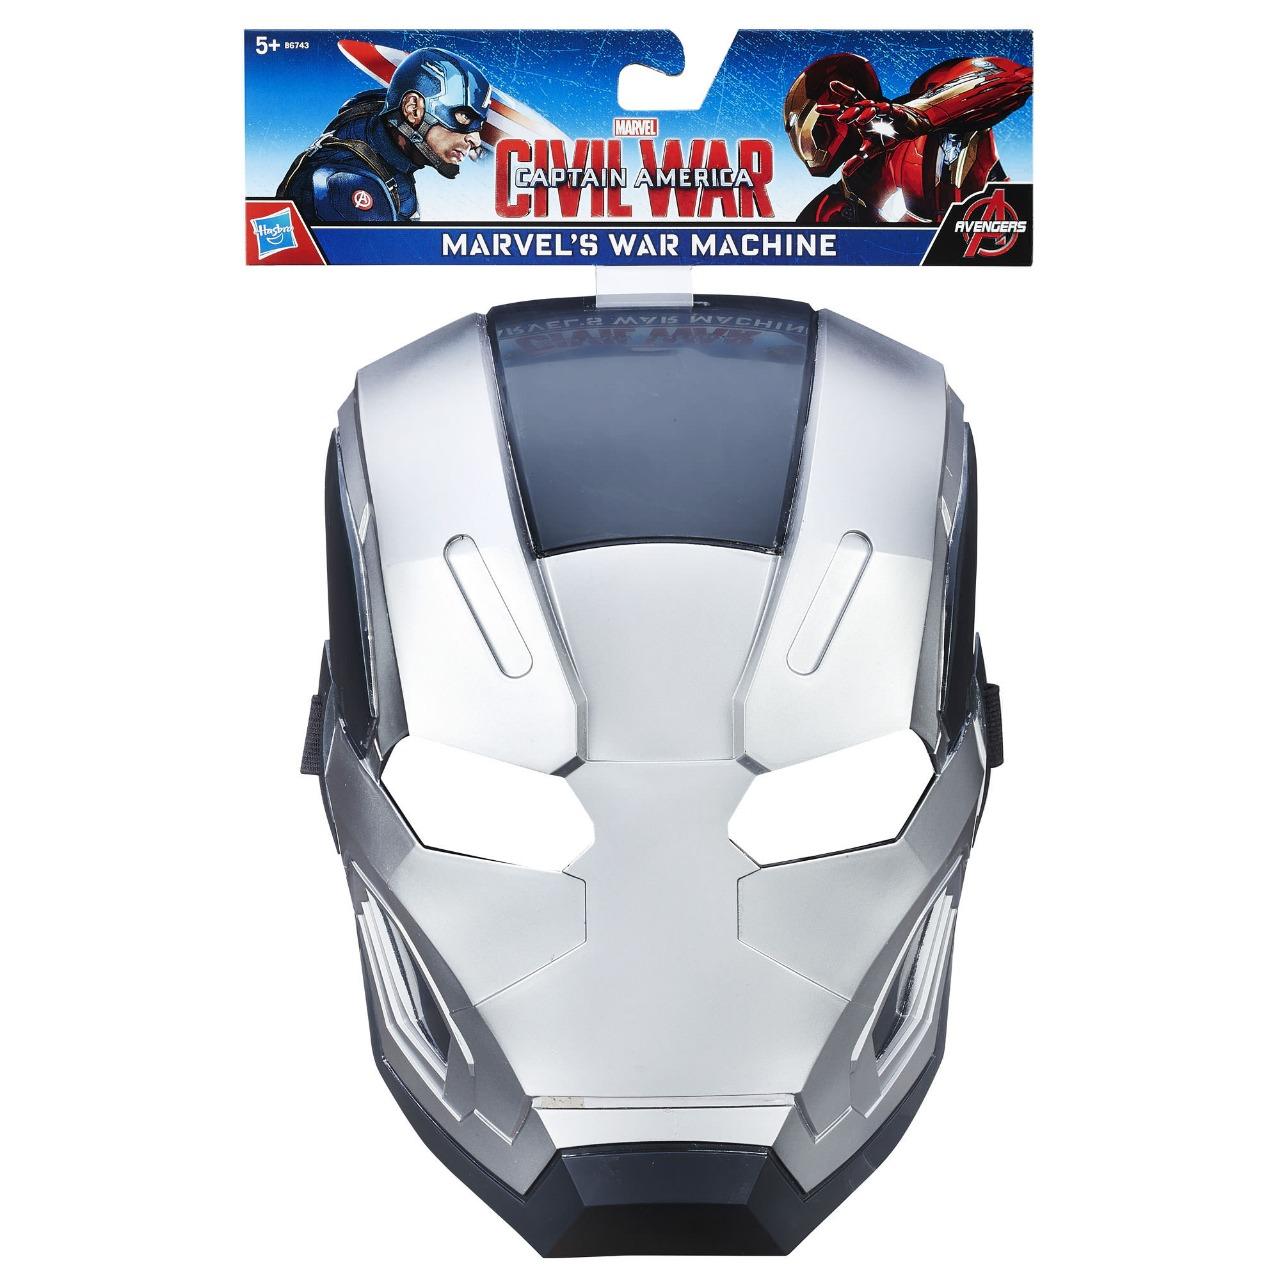 Máscara Infantil Temática War Machine Guerra Civil Marvel Com Apoio  Emborrachado Hasbro